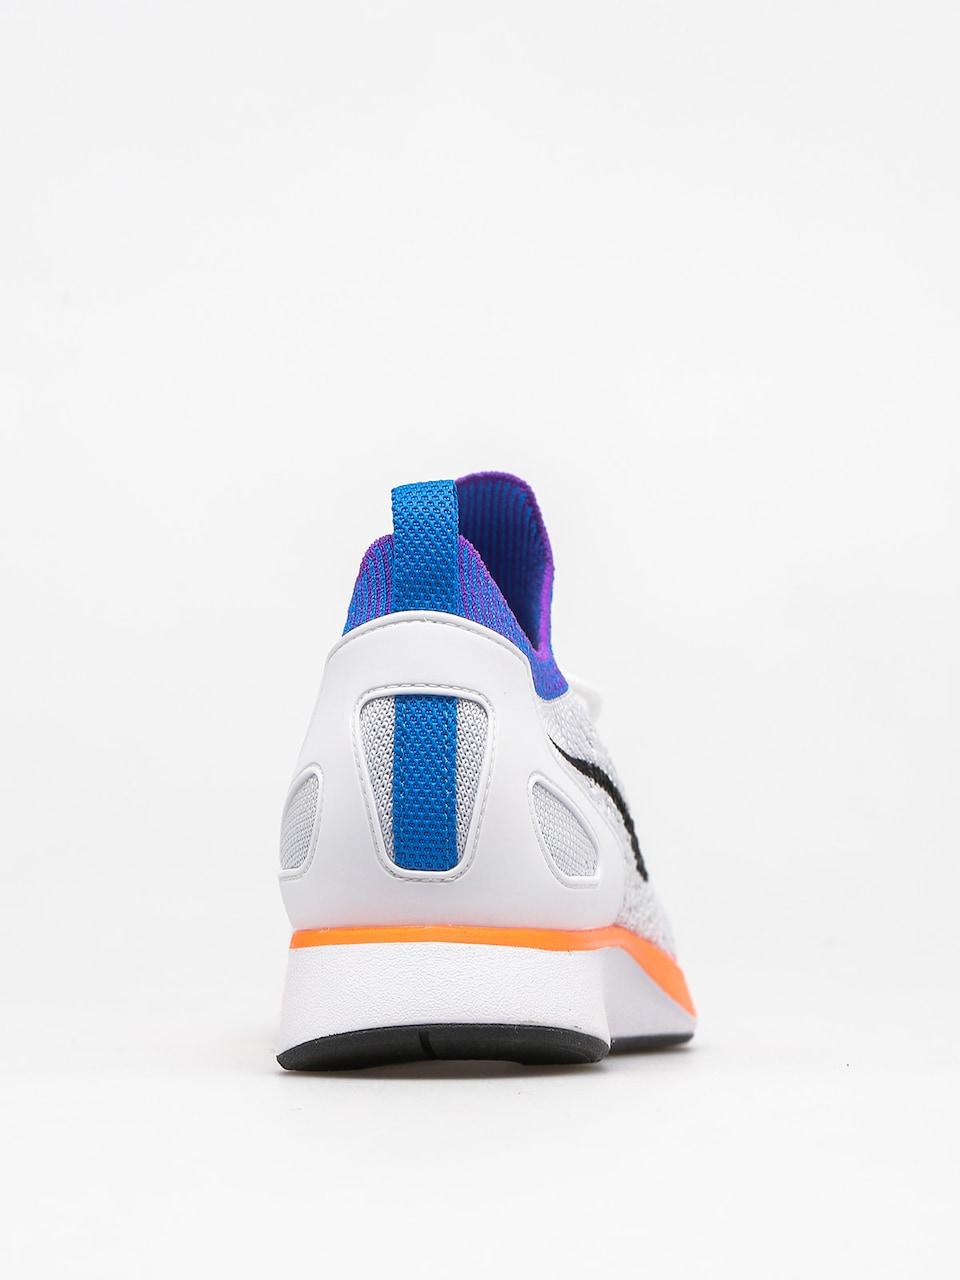 Buty Nike Air Zoom Mariah Flyknit Racer Wmn (whitehyper crimson pure platinum)